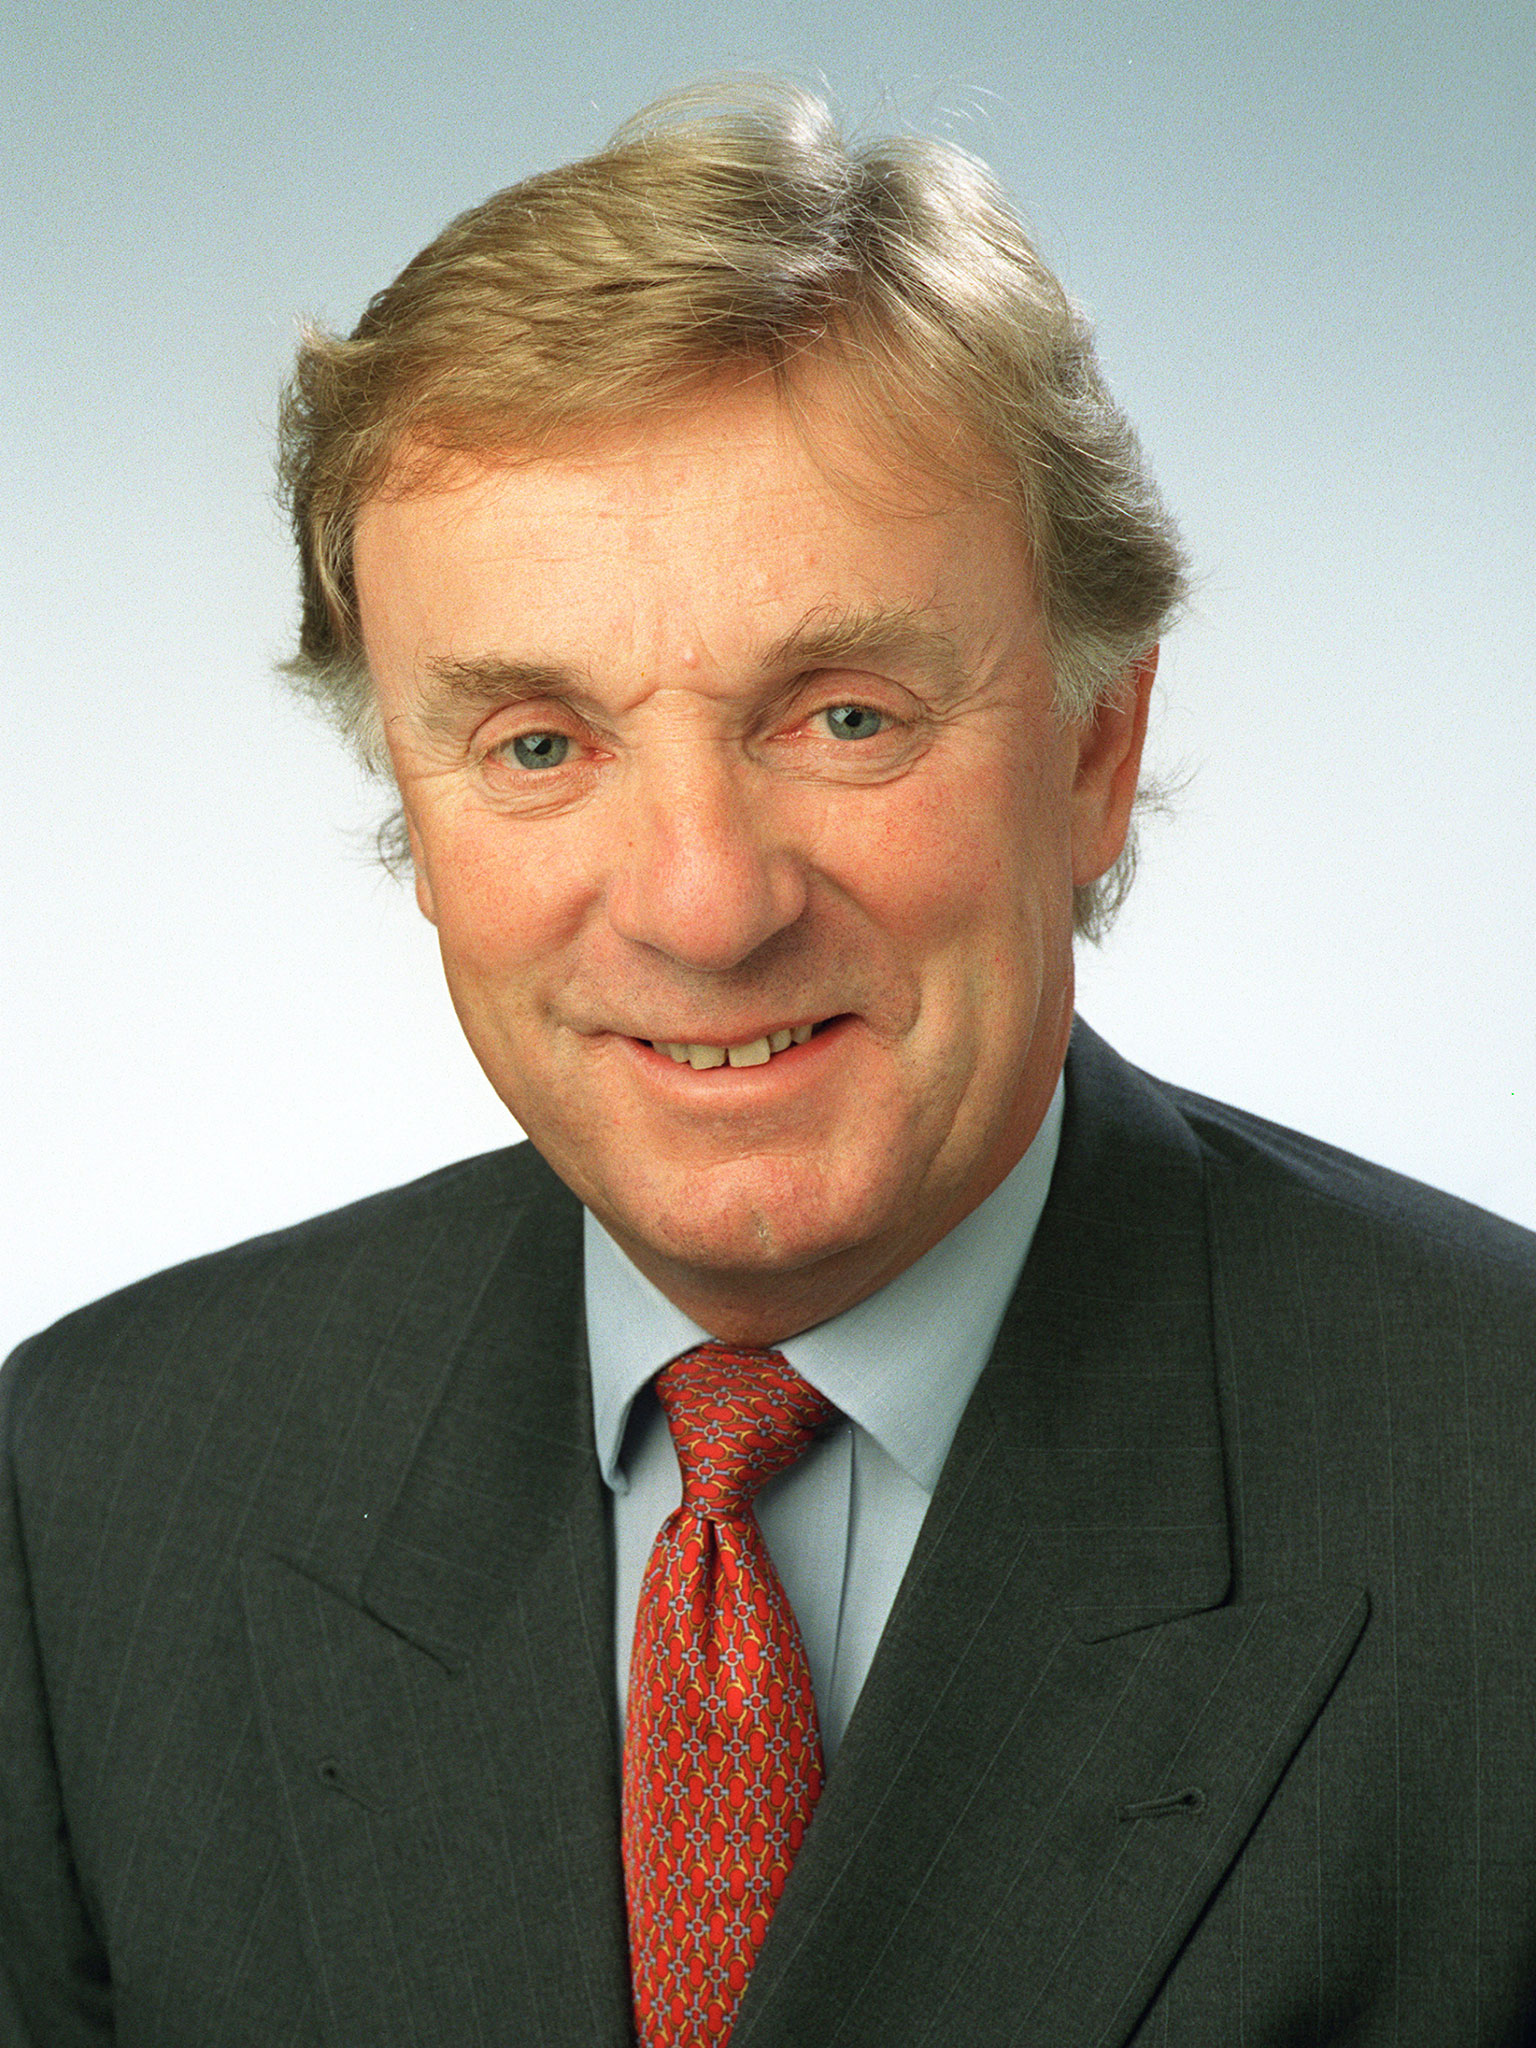 Richard Ottaway MP